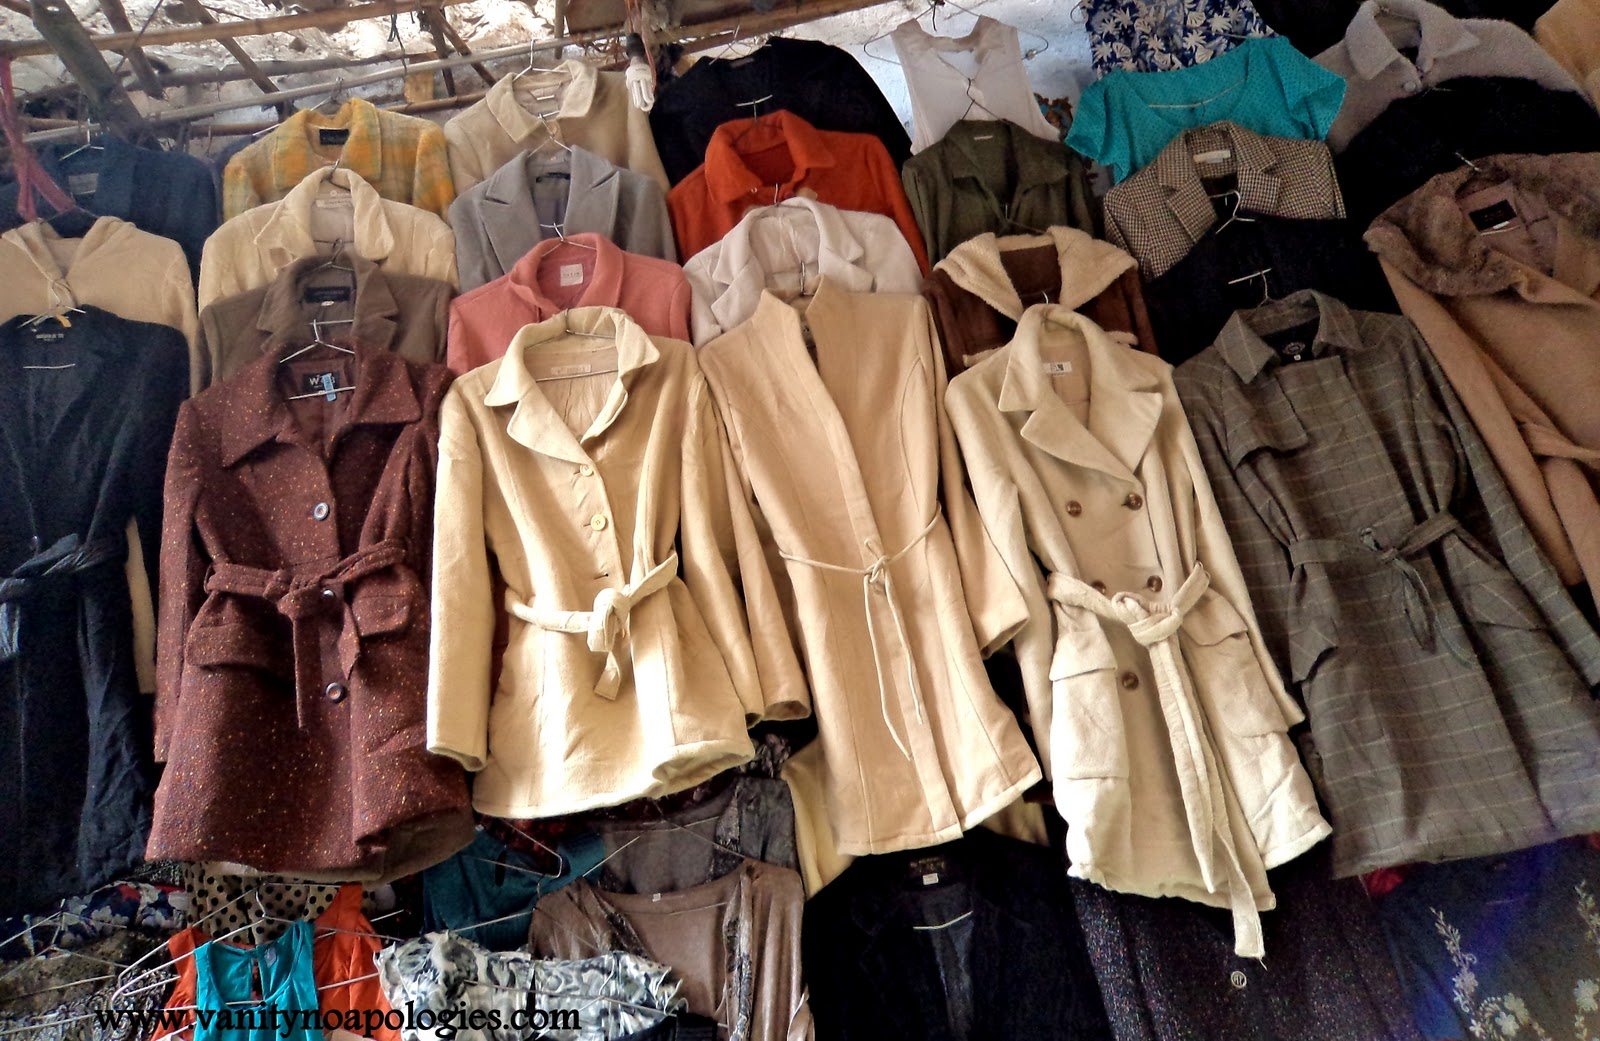 A Complete Low Down On Thrift Shopping - Sarojini Nagar